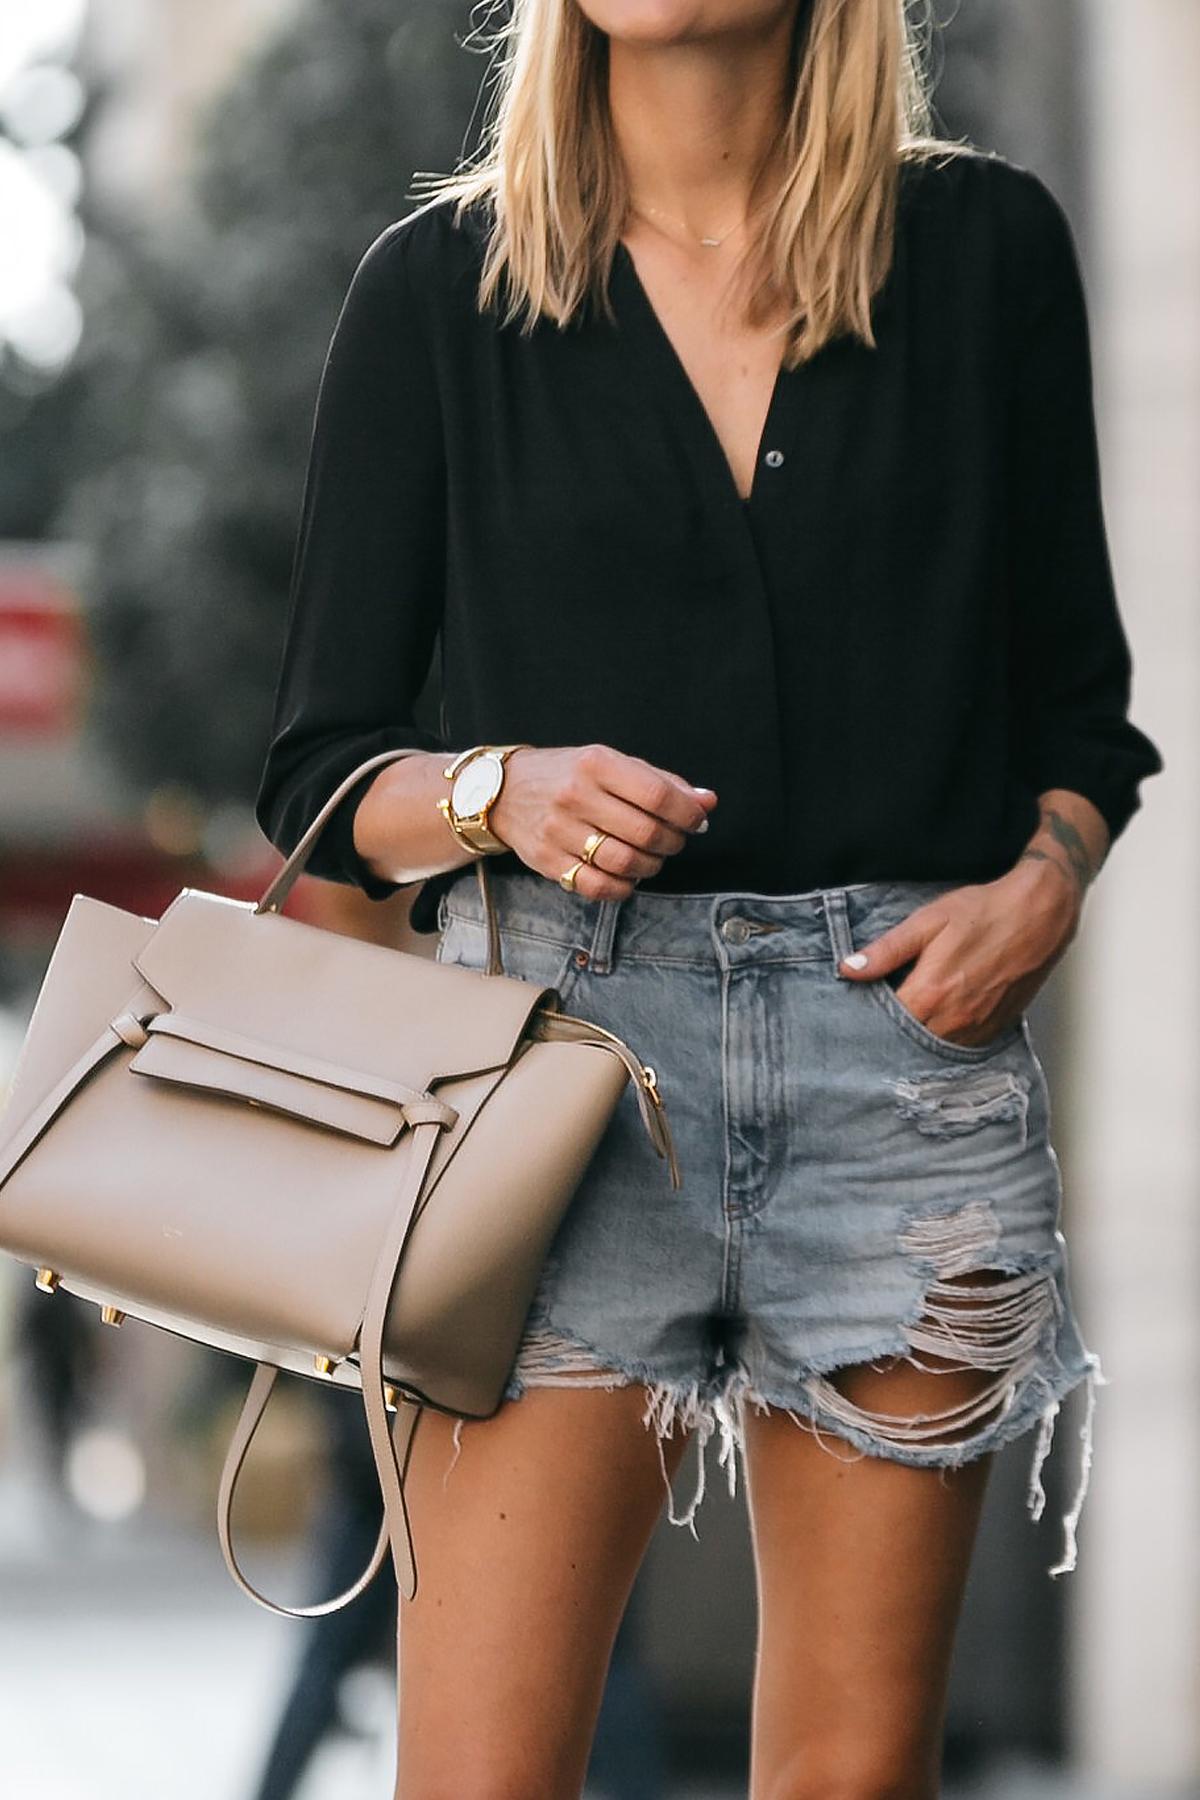 Blonde Woman Wearing Nodstrom Black Long Sleeve Button Down Blouse Topshop Denim Ripped Mom Shorts Outfit Celine Belt Bag Fashion Jackson Dallas Blogger Fashion Blogger Street Style